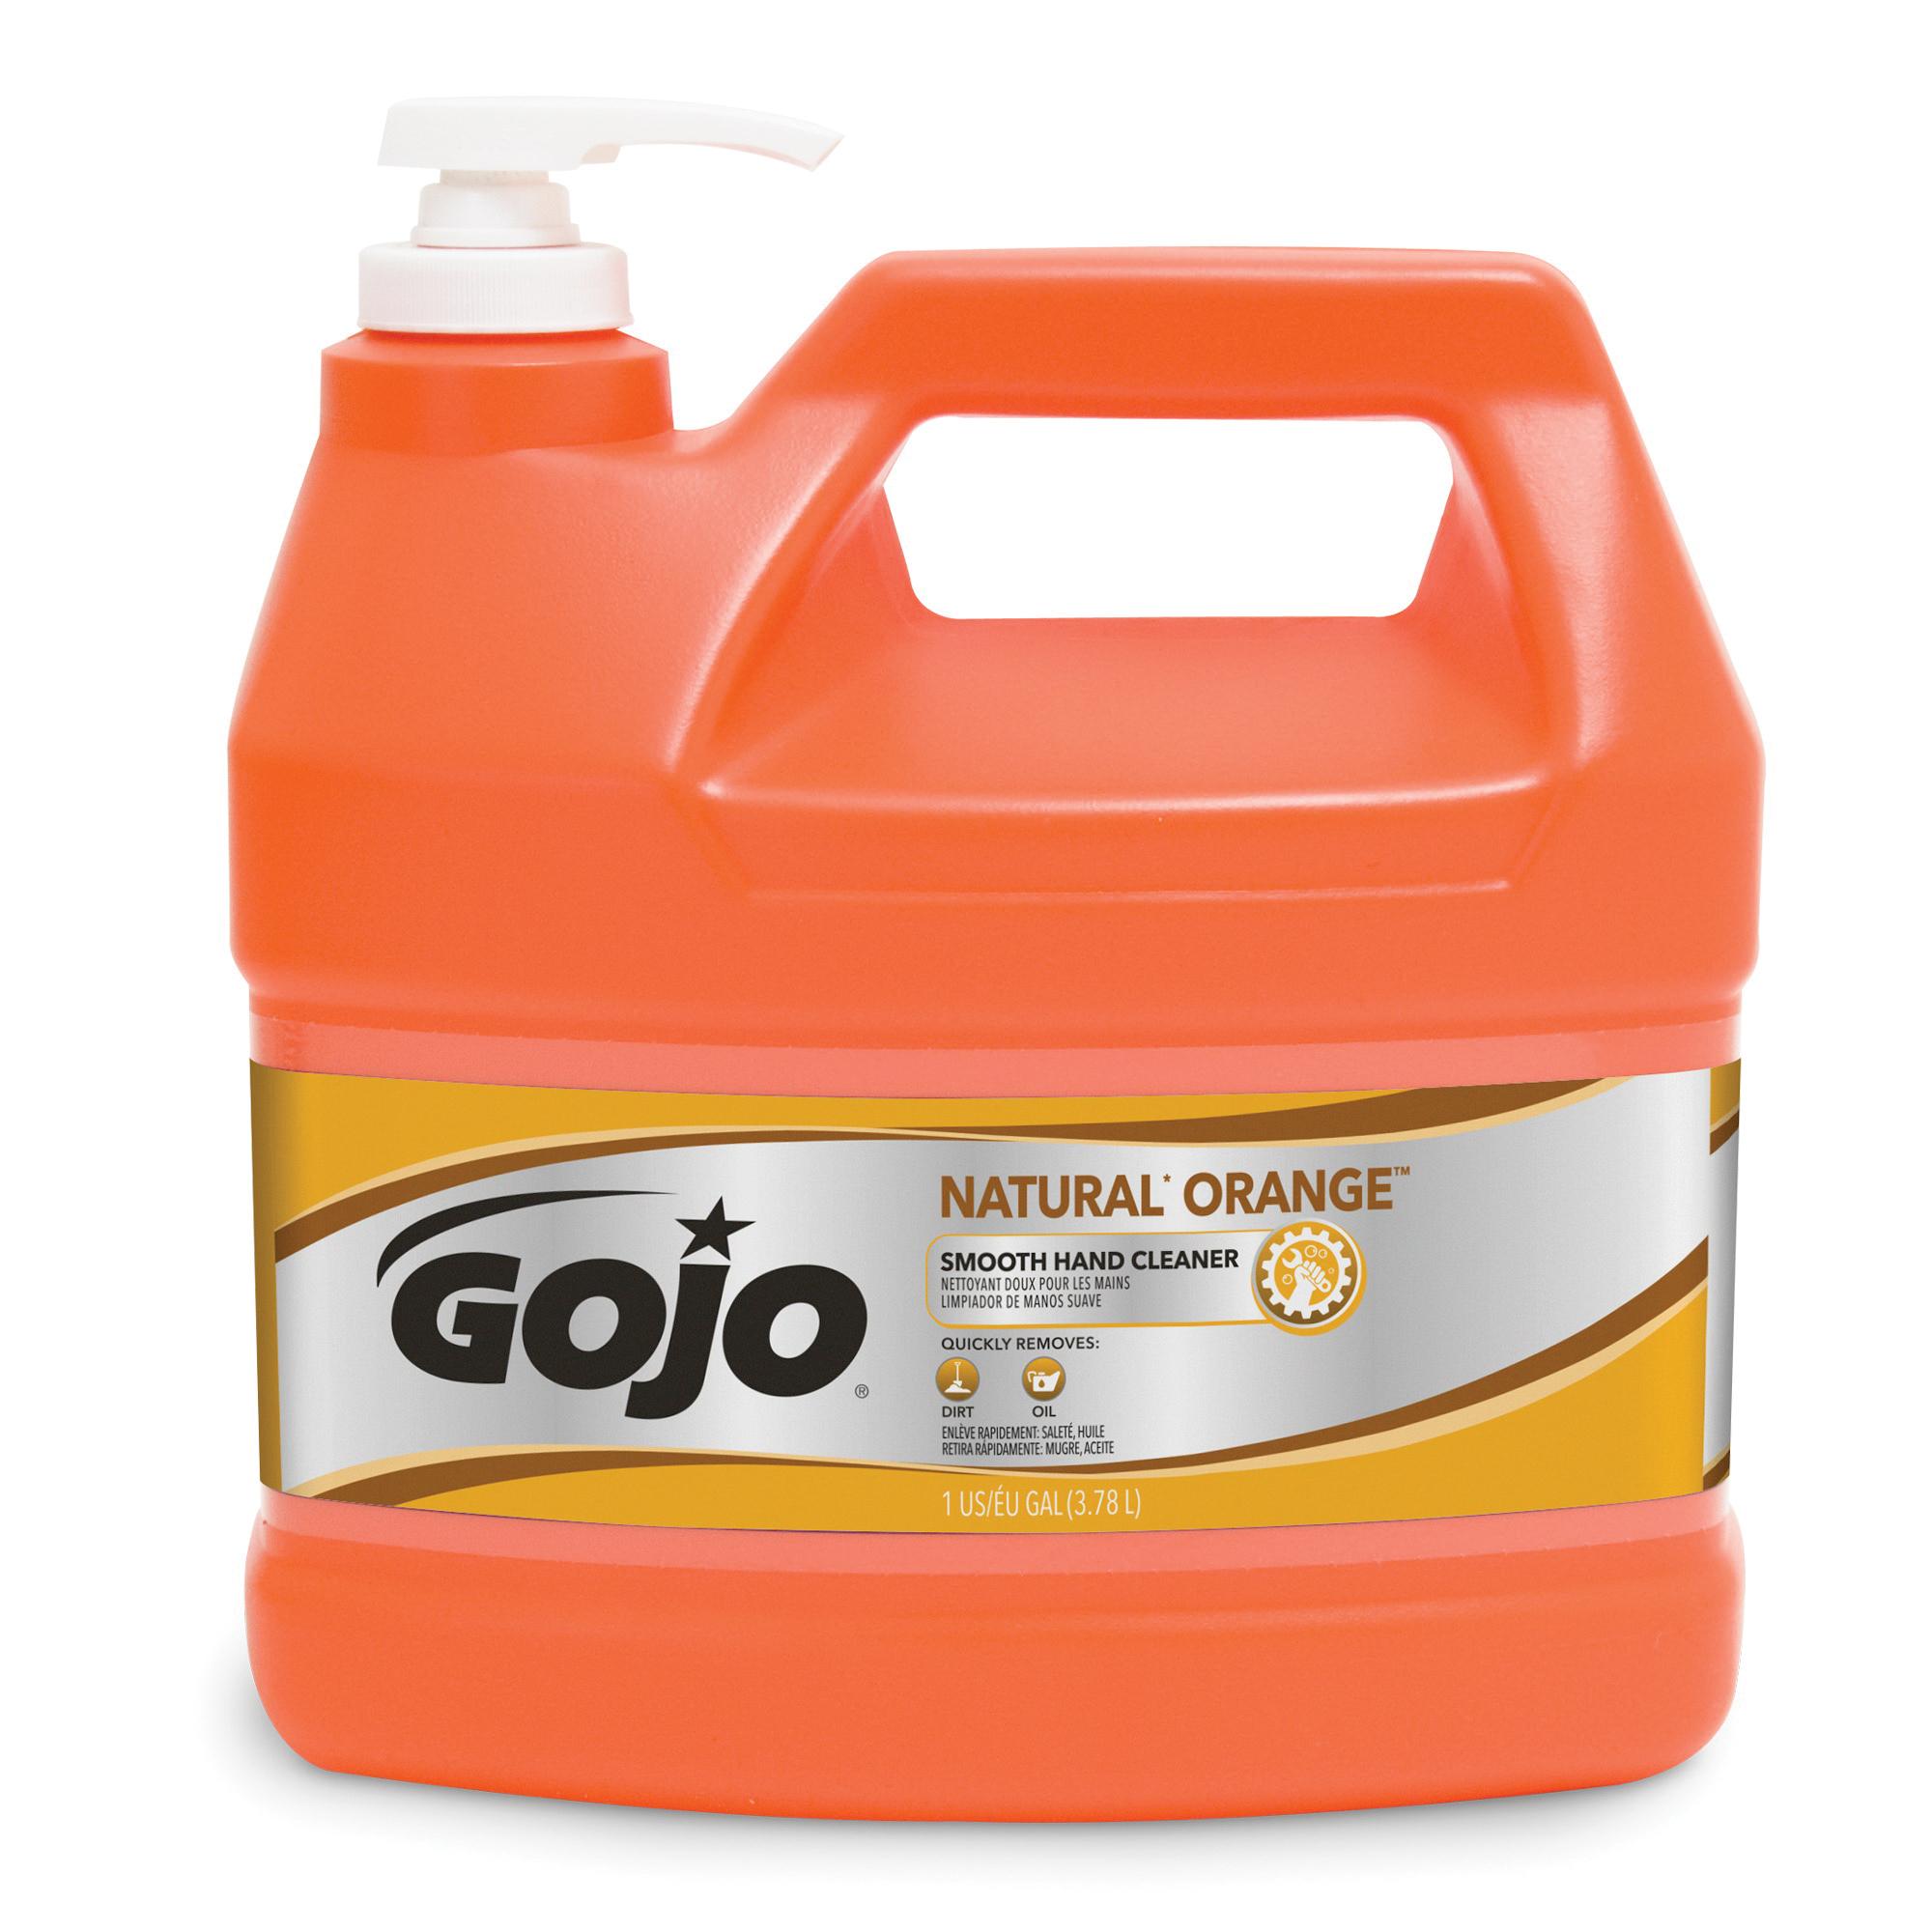 GOJO® 0945-04 NATURAL ORANGE™ Smooth Hand Cleaner, 1 gal, Pump Bottle, Lotion, Citrus, Orange